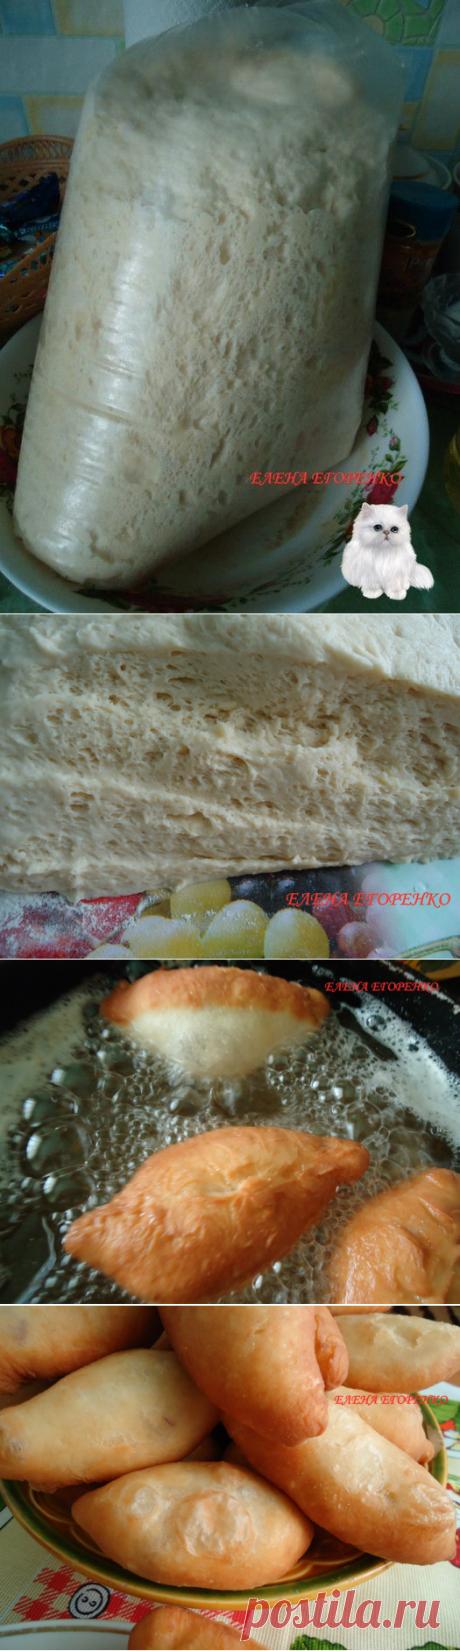 Дрожжевое тесто по рецепту Натальи Тихоновой